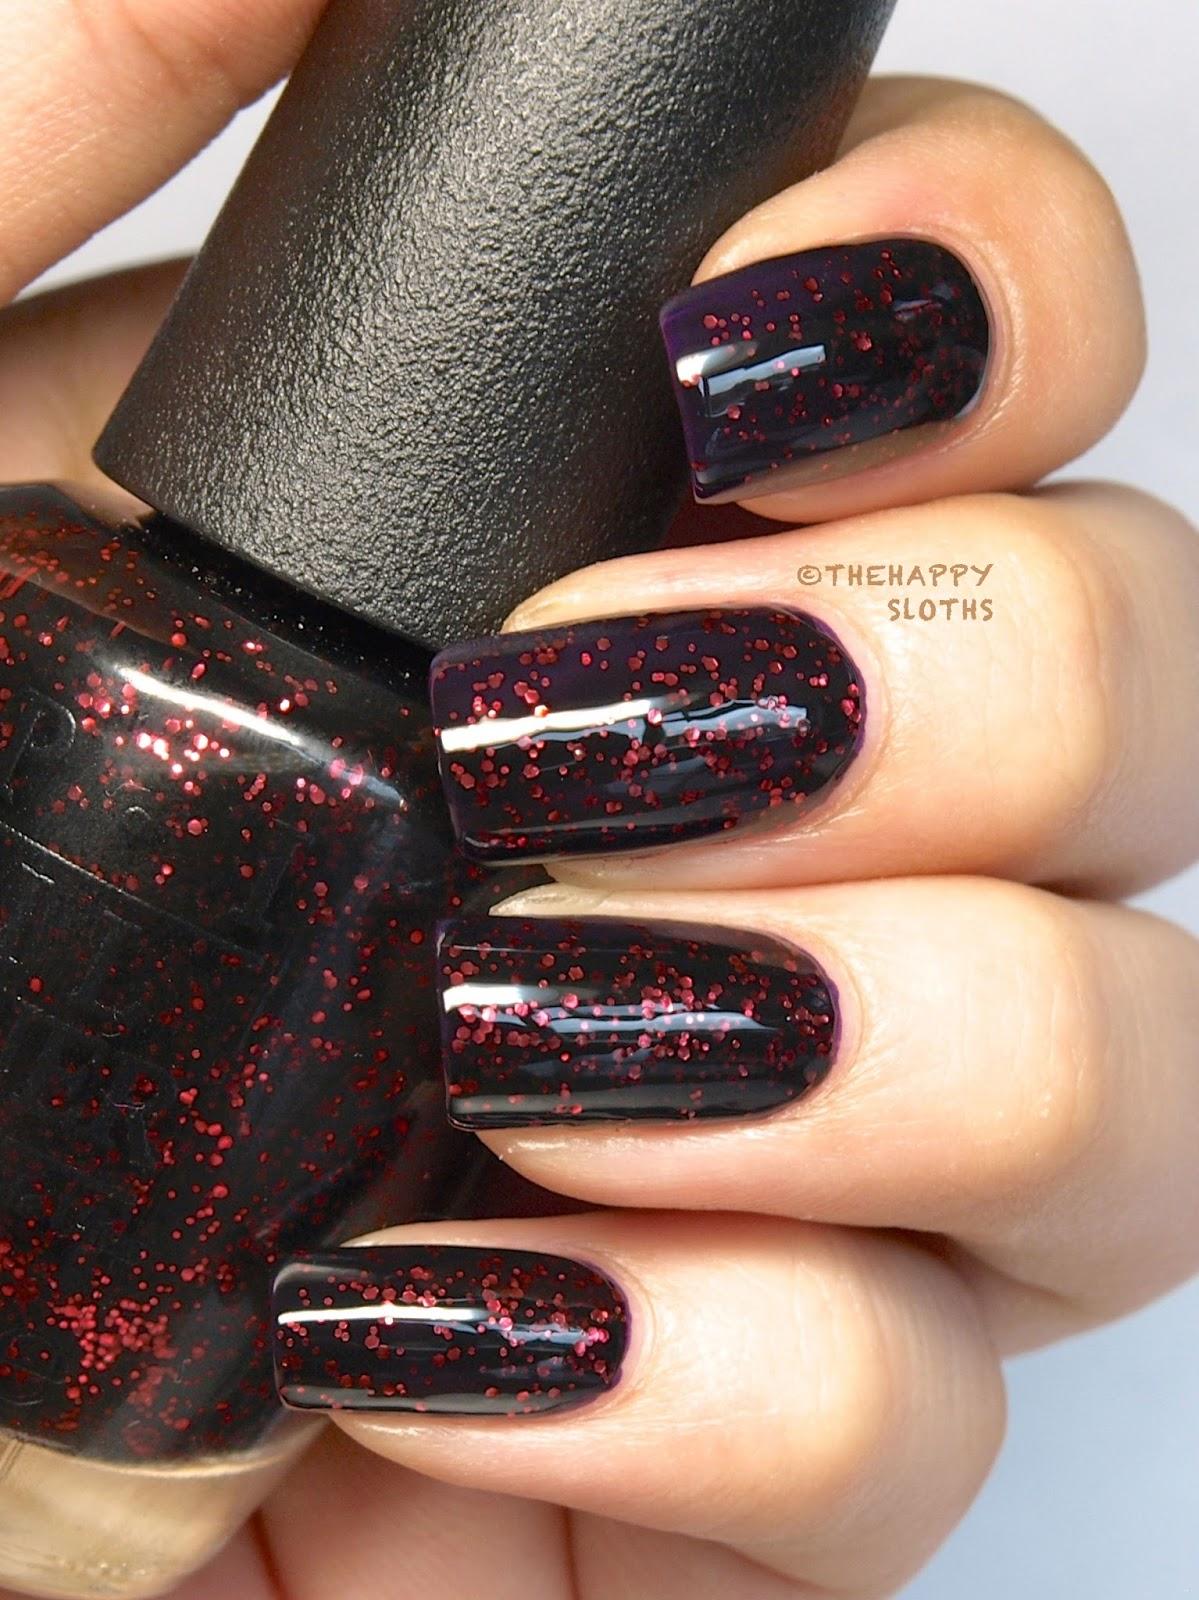 opi coca cola nail polish review swatches today i accomplished zero